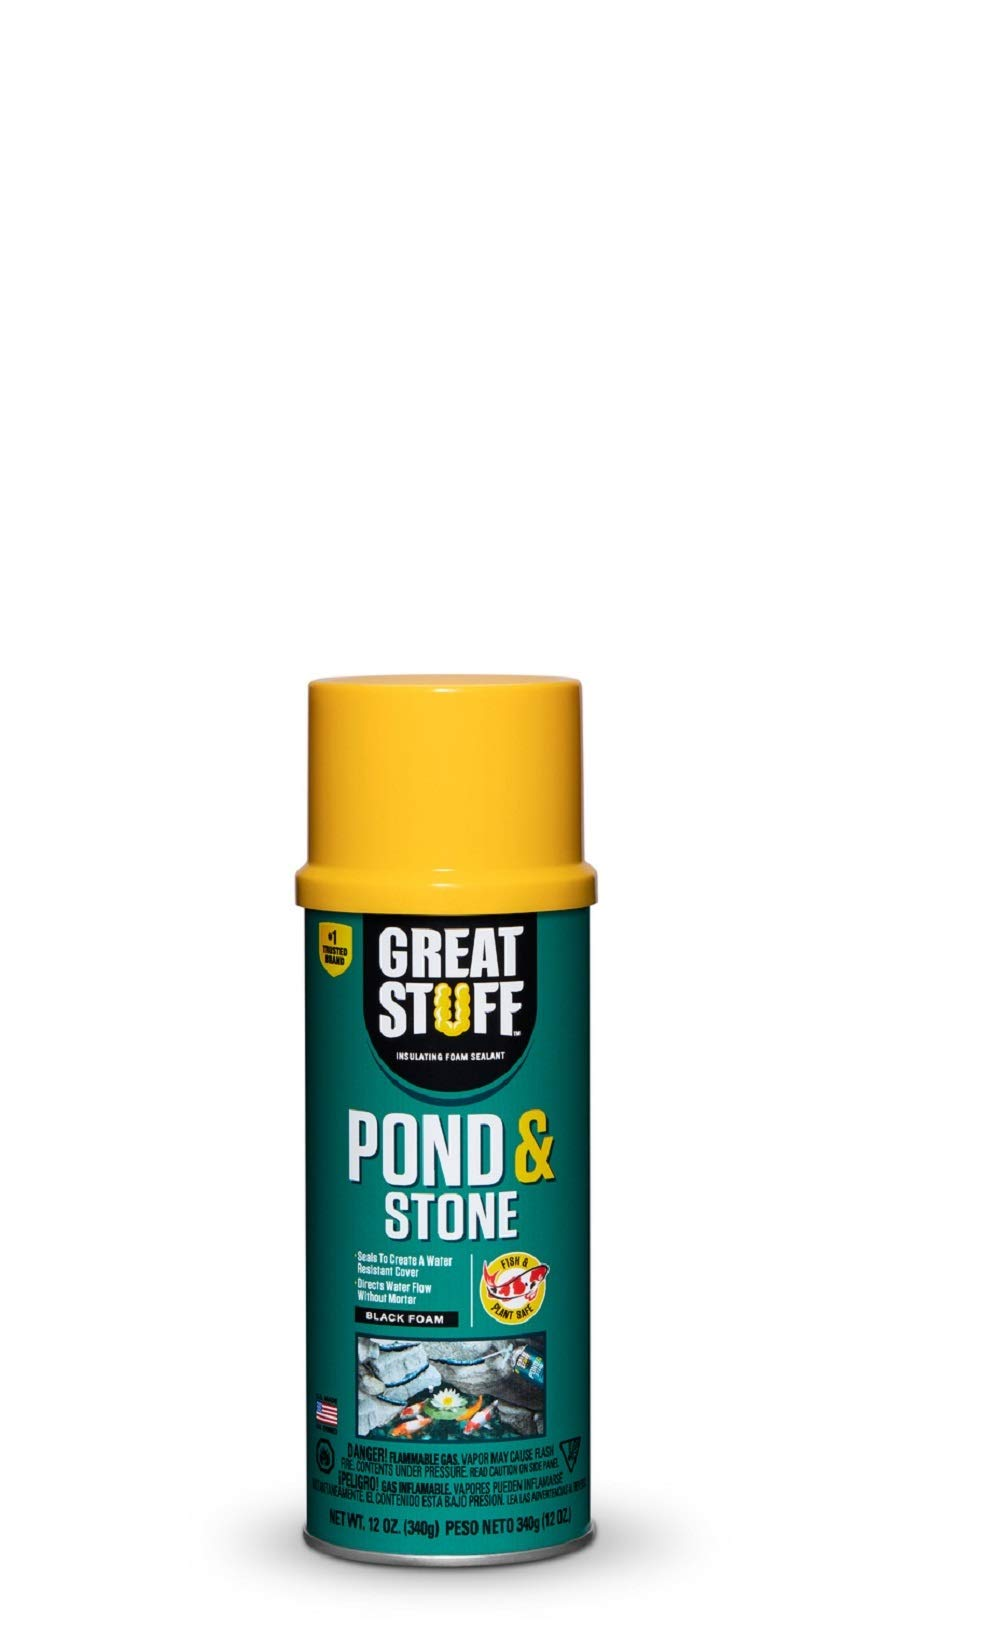 GREAT STUFF Pond & Stone 12 oz Insulating Foam Sealant